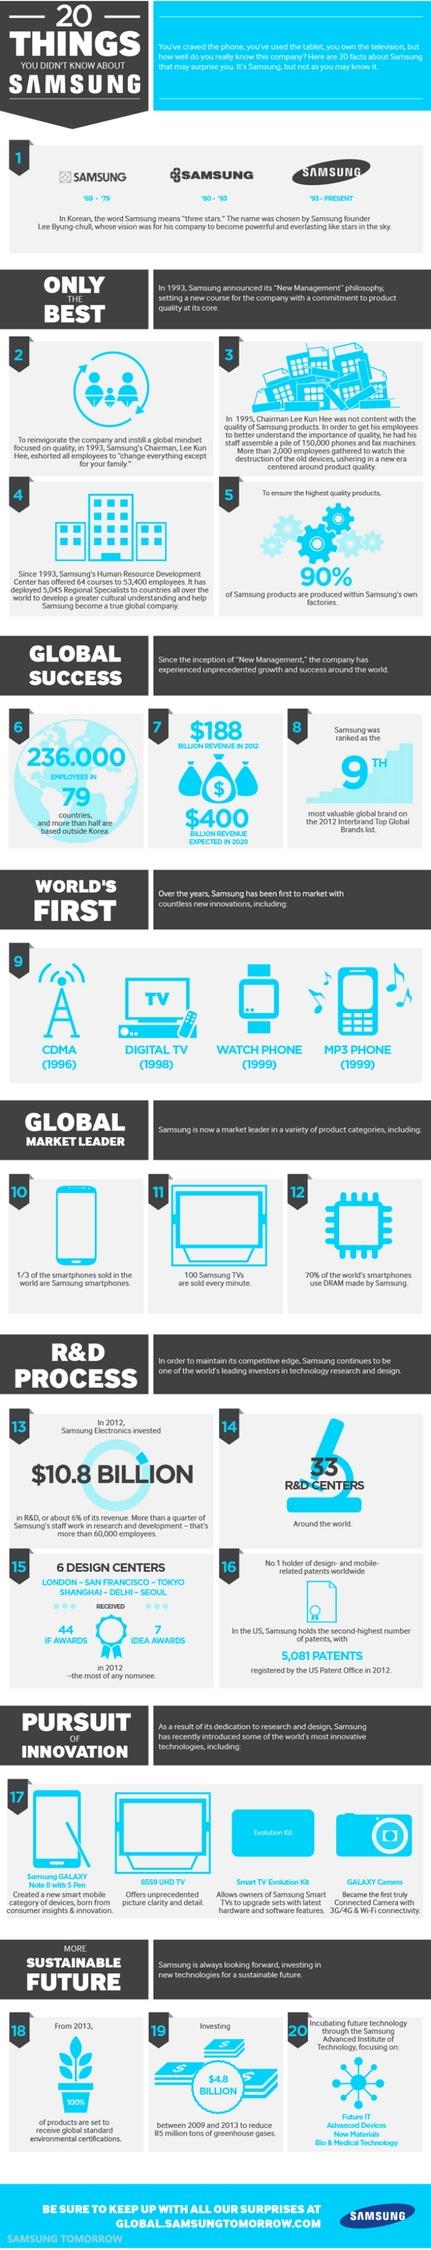 20 Samsung - ellosamsung | ello